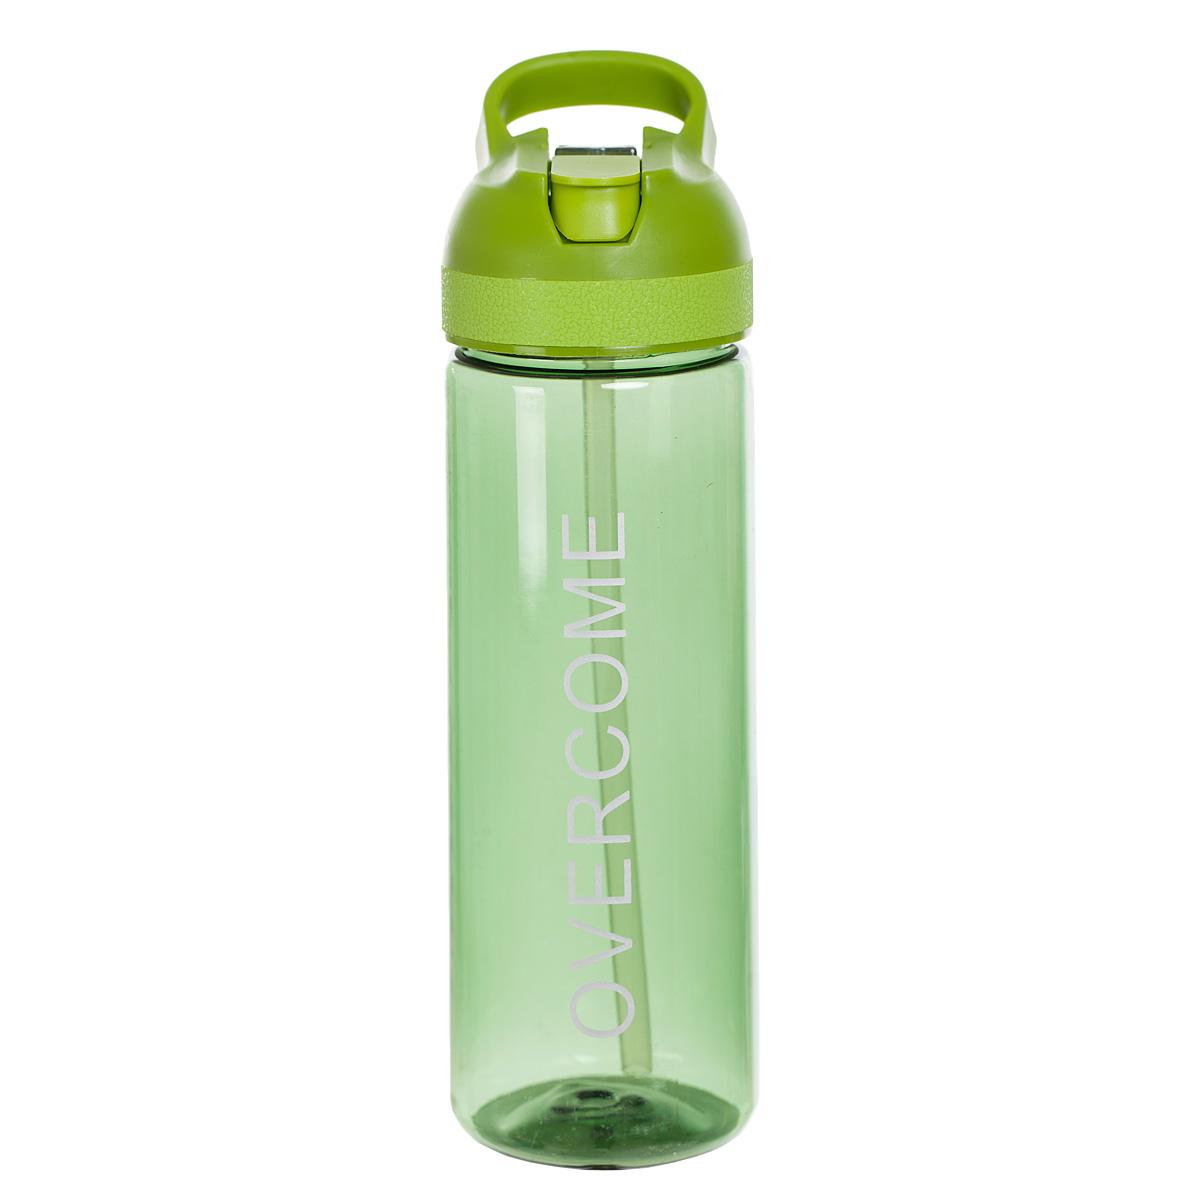 Бутылка для воды Overcome, 25571-7